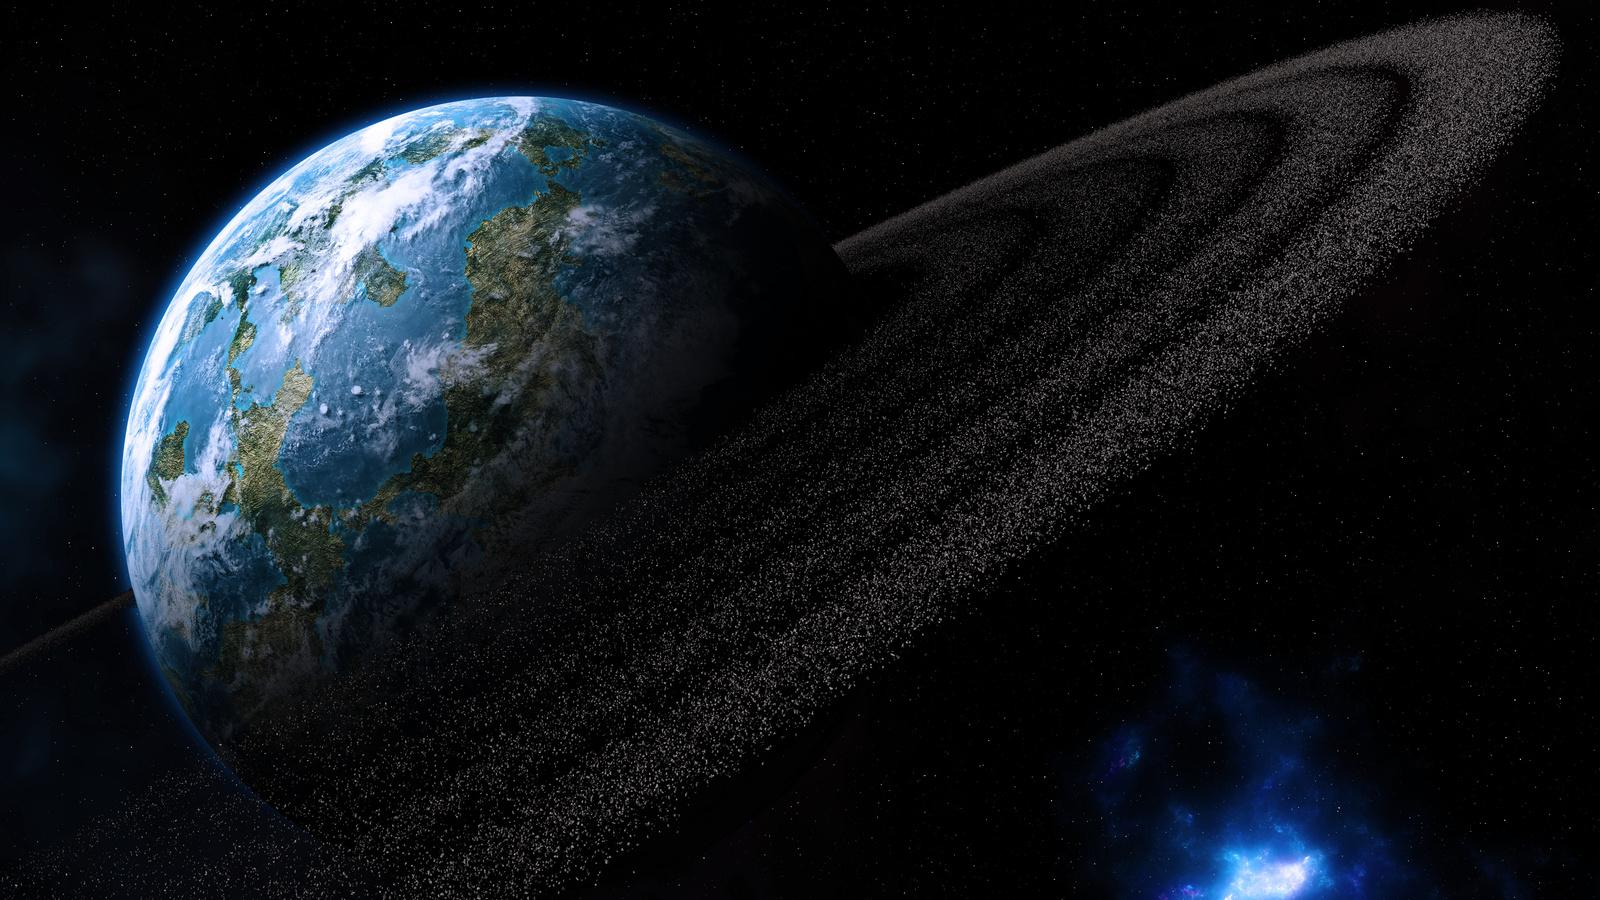 sci fi, asteroids, Planets, rocks, meteorites